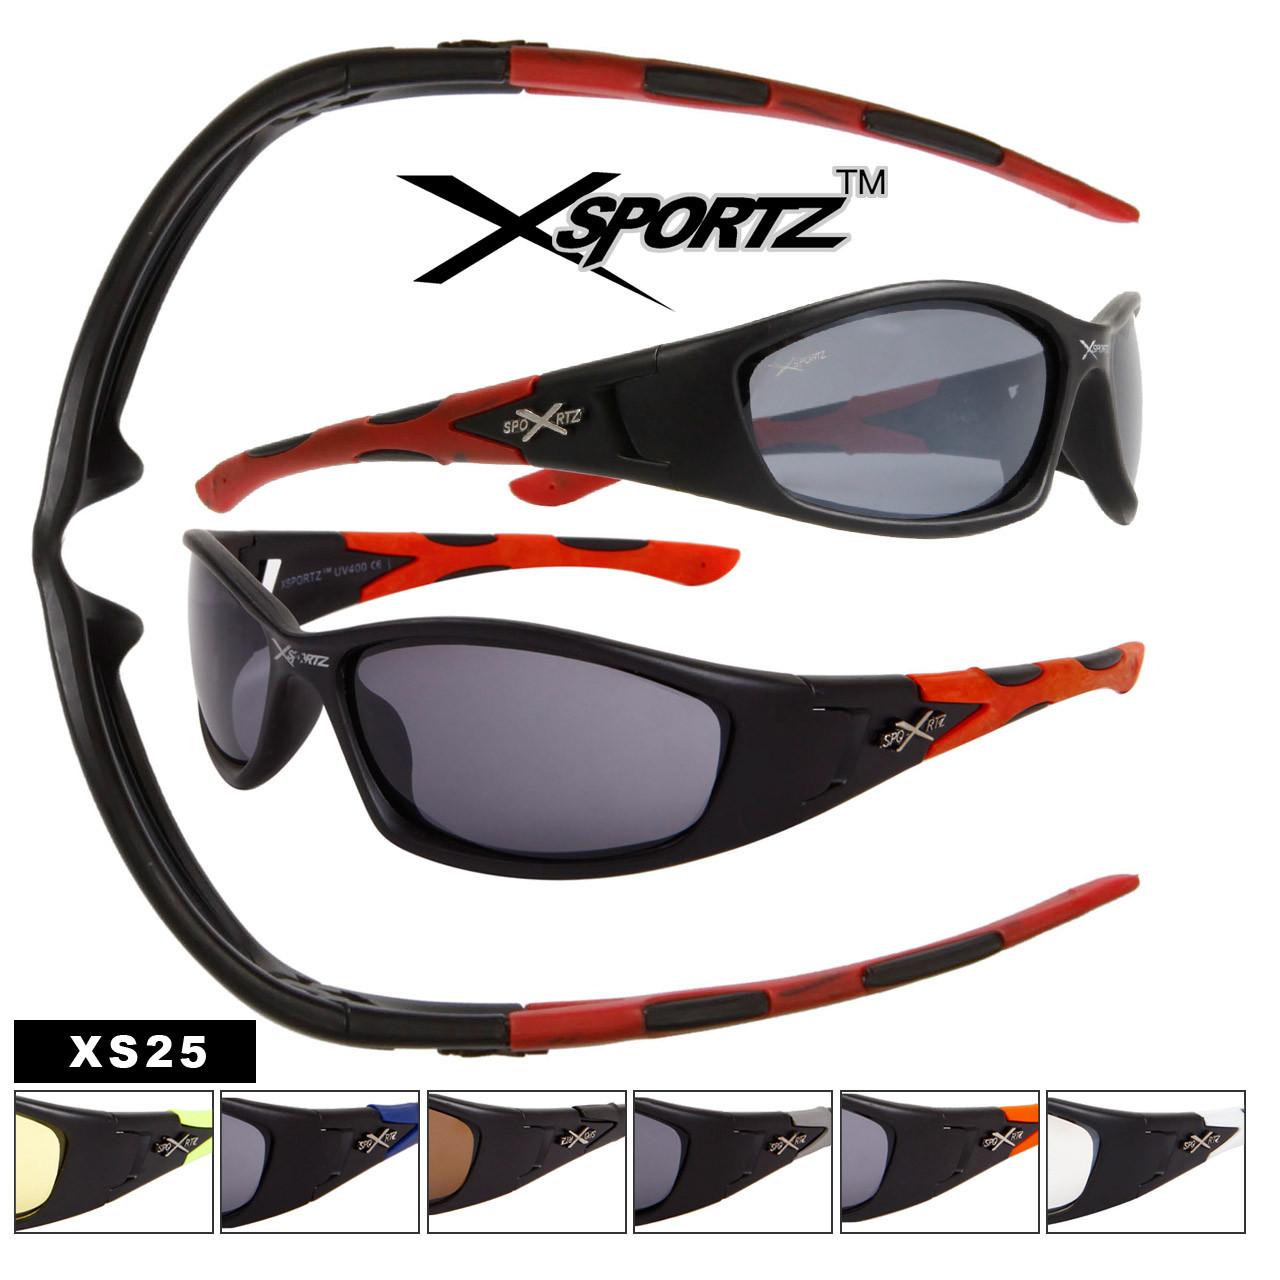 Xsportz™ Wholesale Sports Sunglass Style XS25 (12 pcs.) (Assorted Colors)